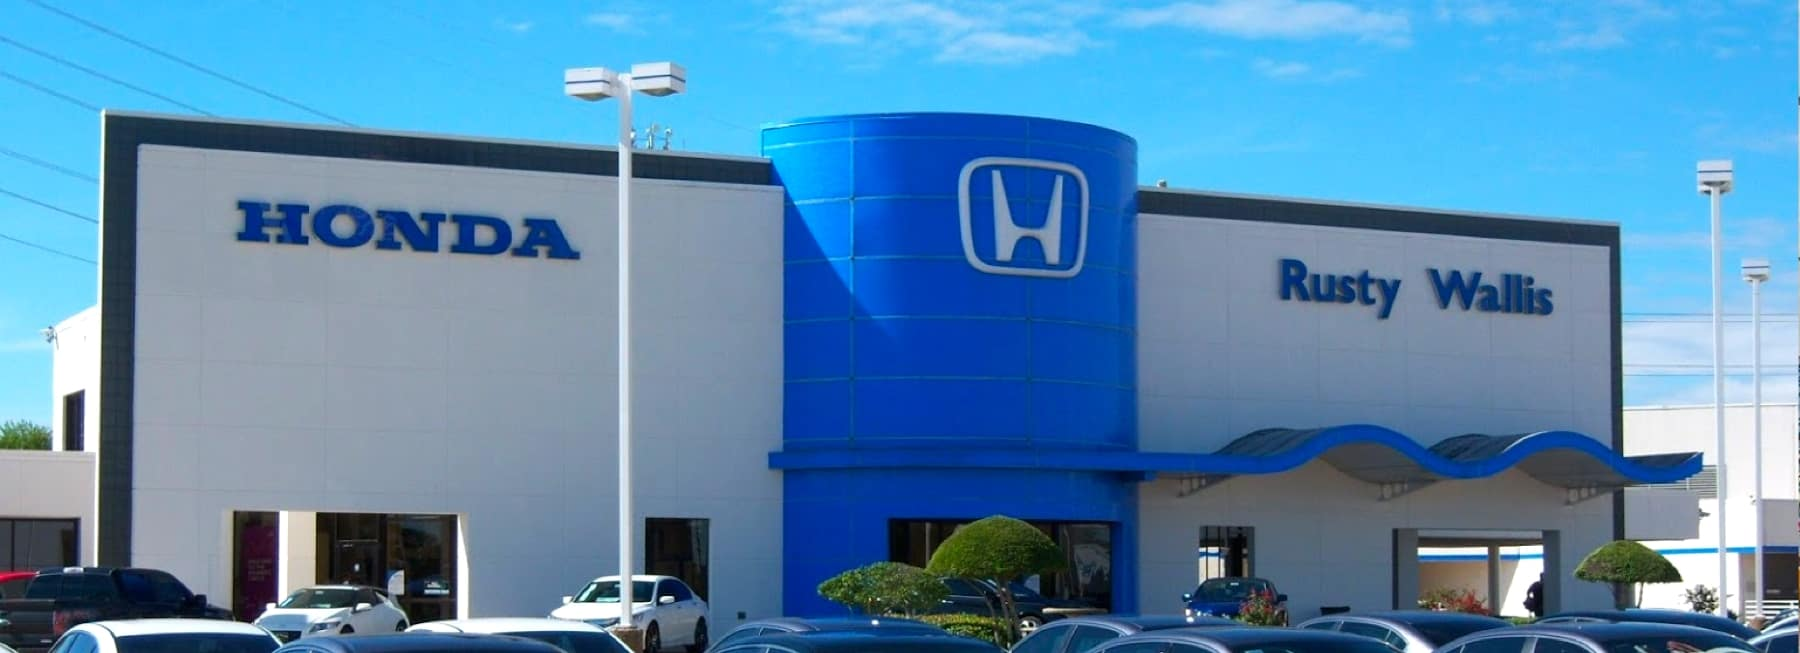 An exterior shot of a Honda dealership